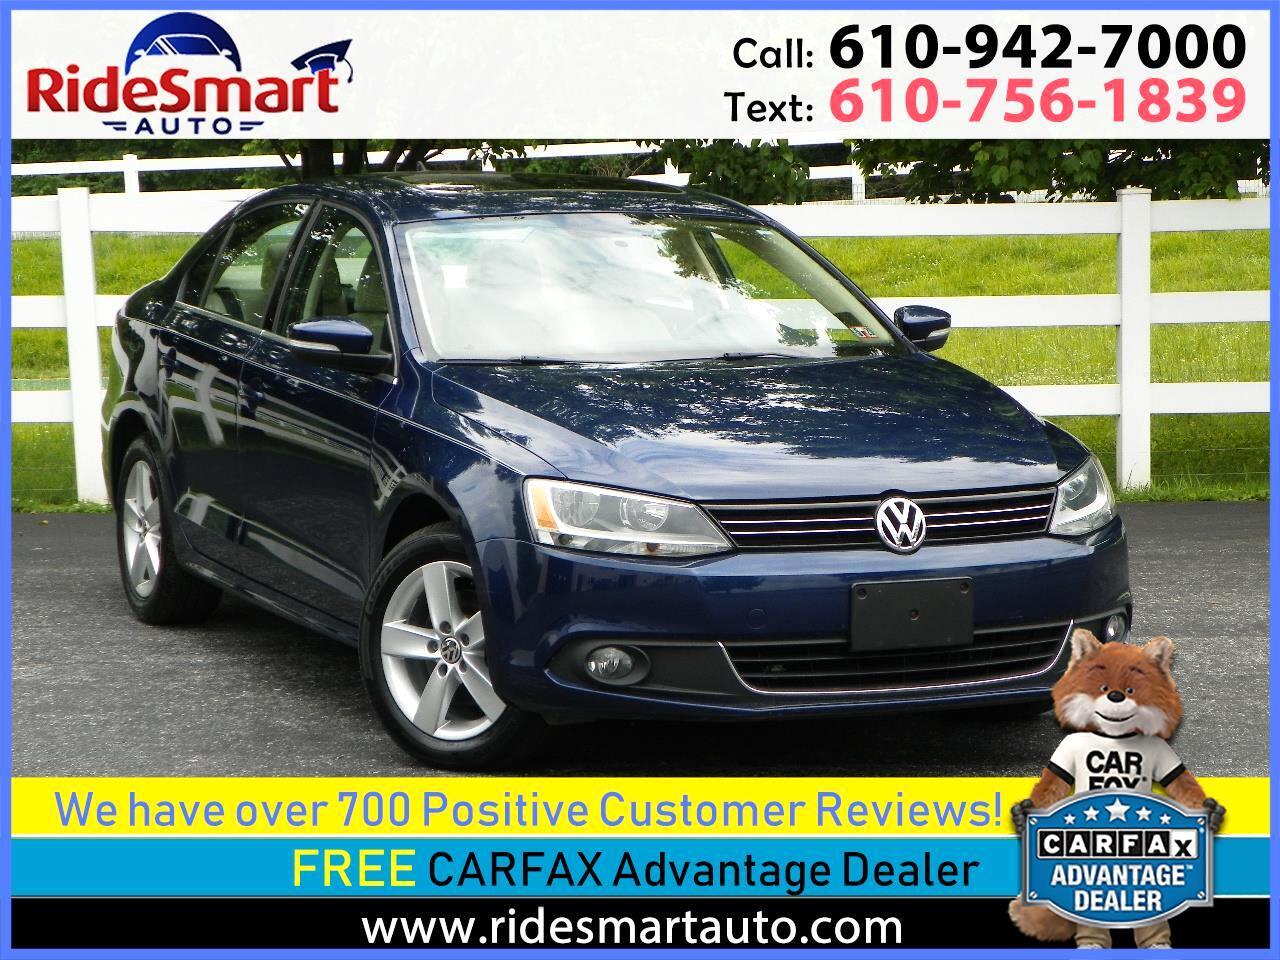 2012 Volkswagen Jetta TDI w/Premium & Navigation